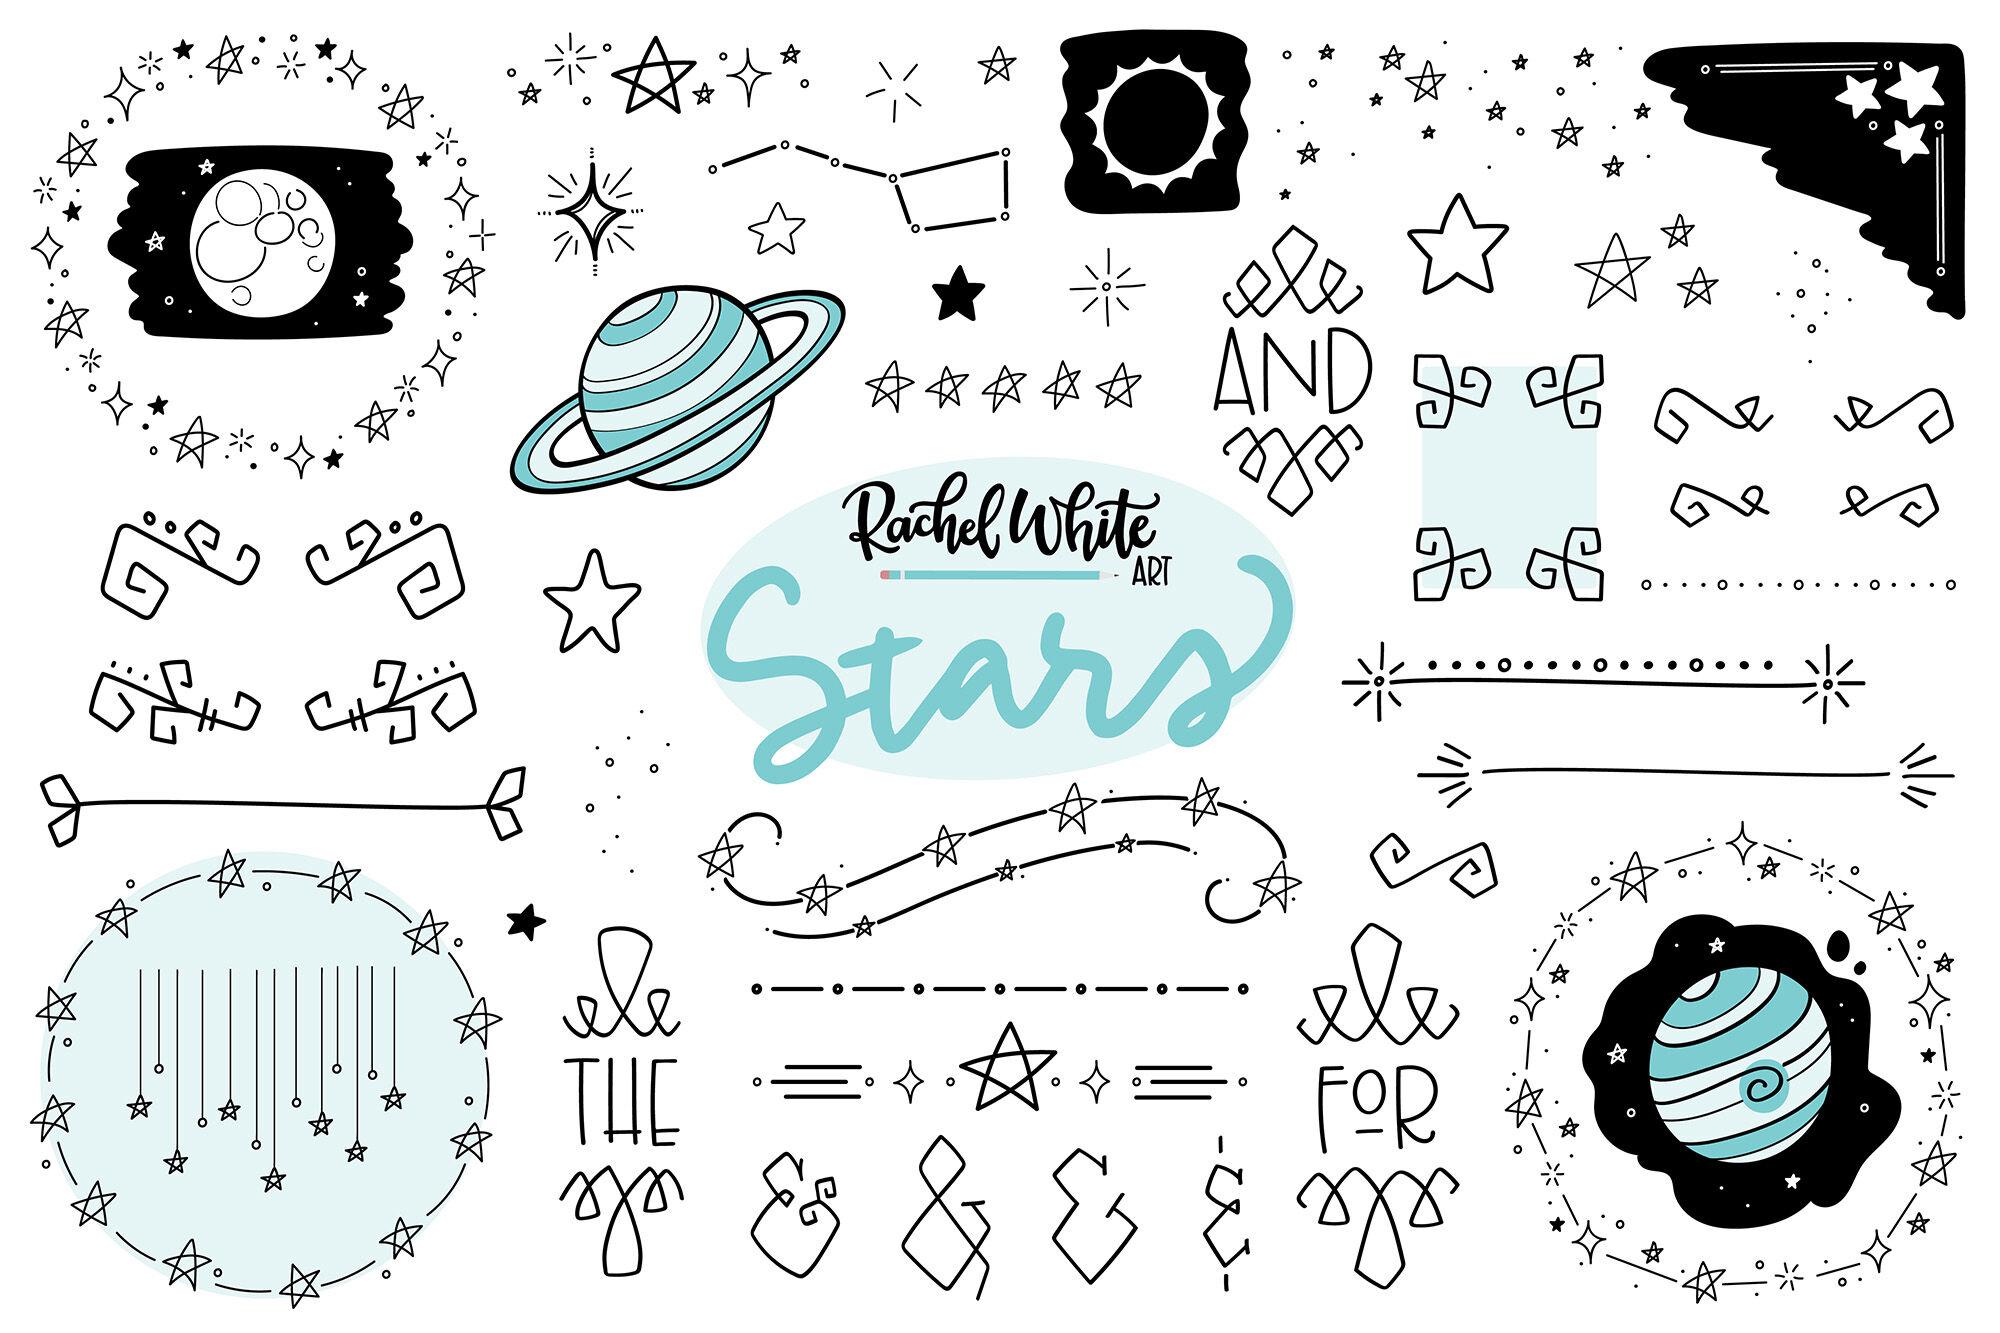 Stars Vector Png Svg By Rachel White Art Thehungryjpeg Com